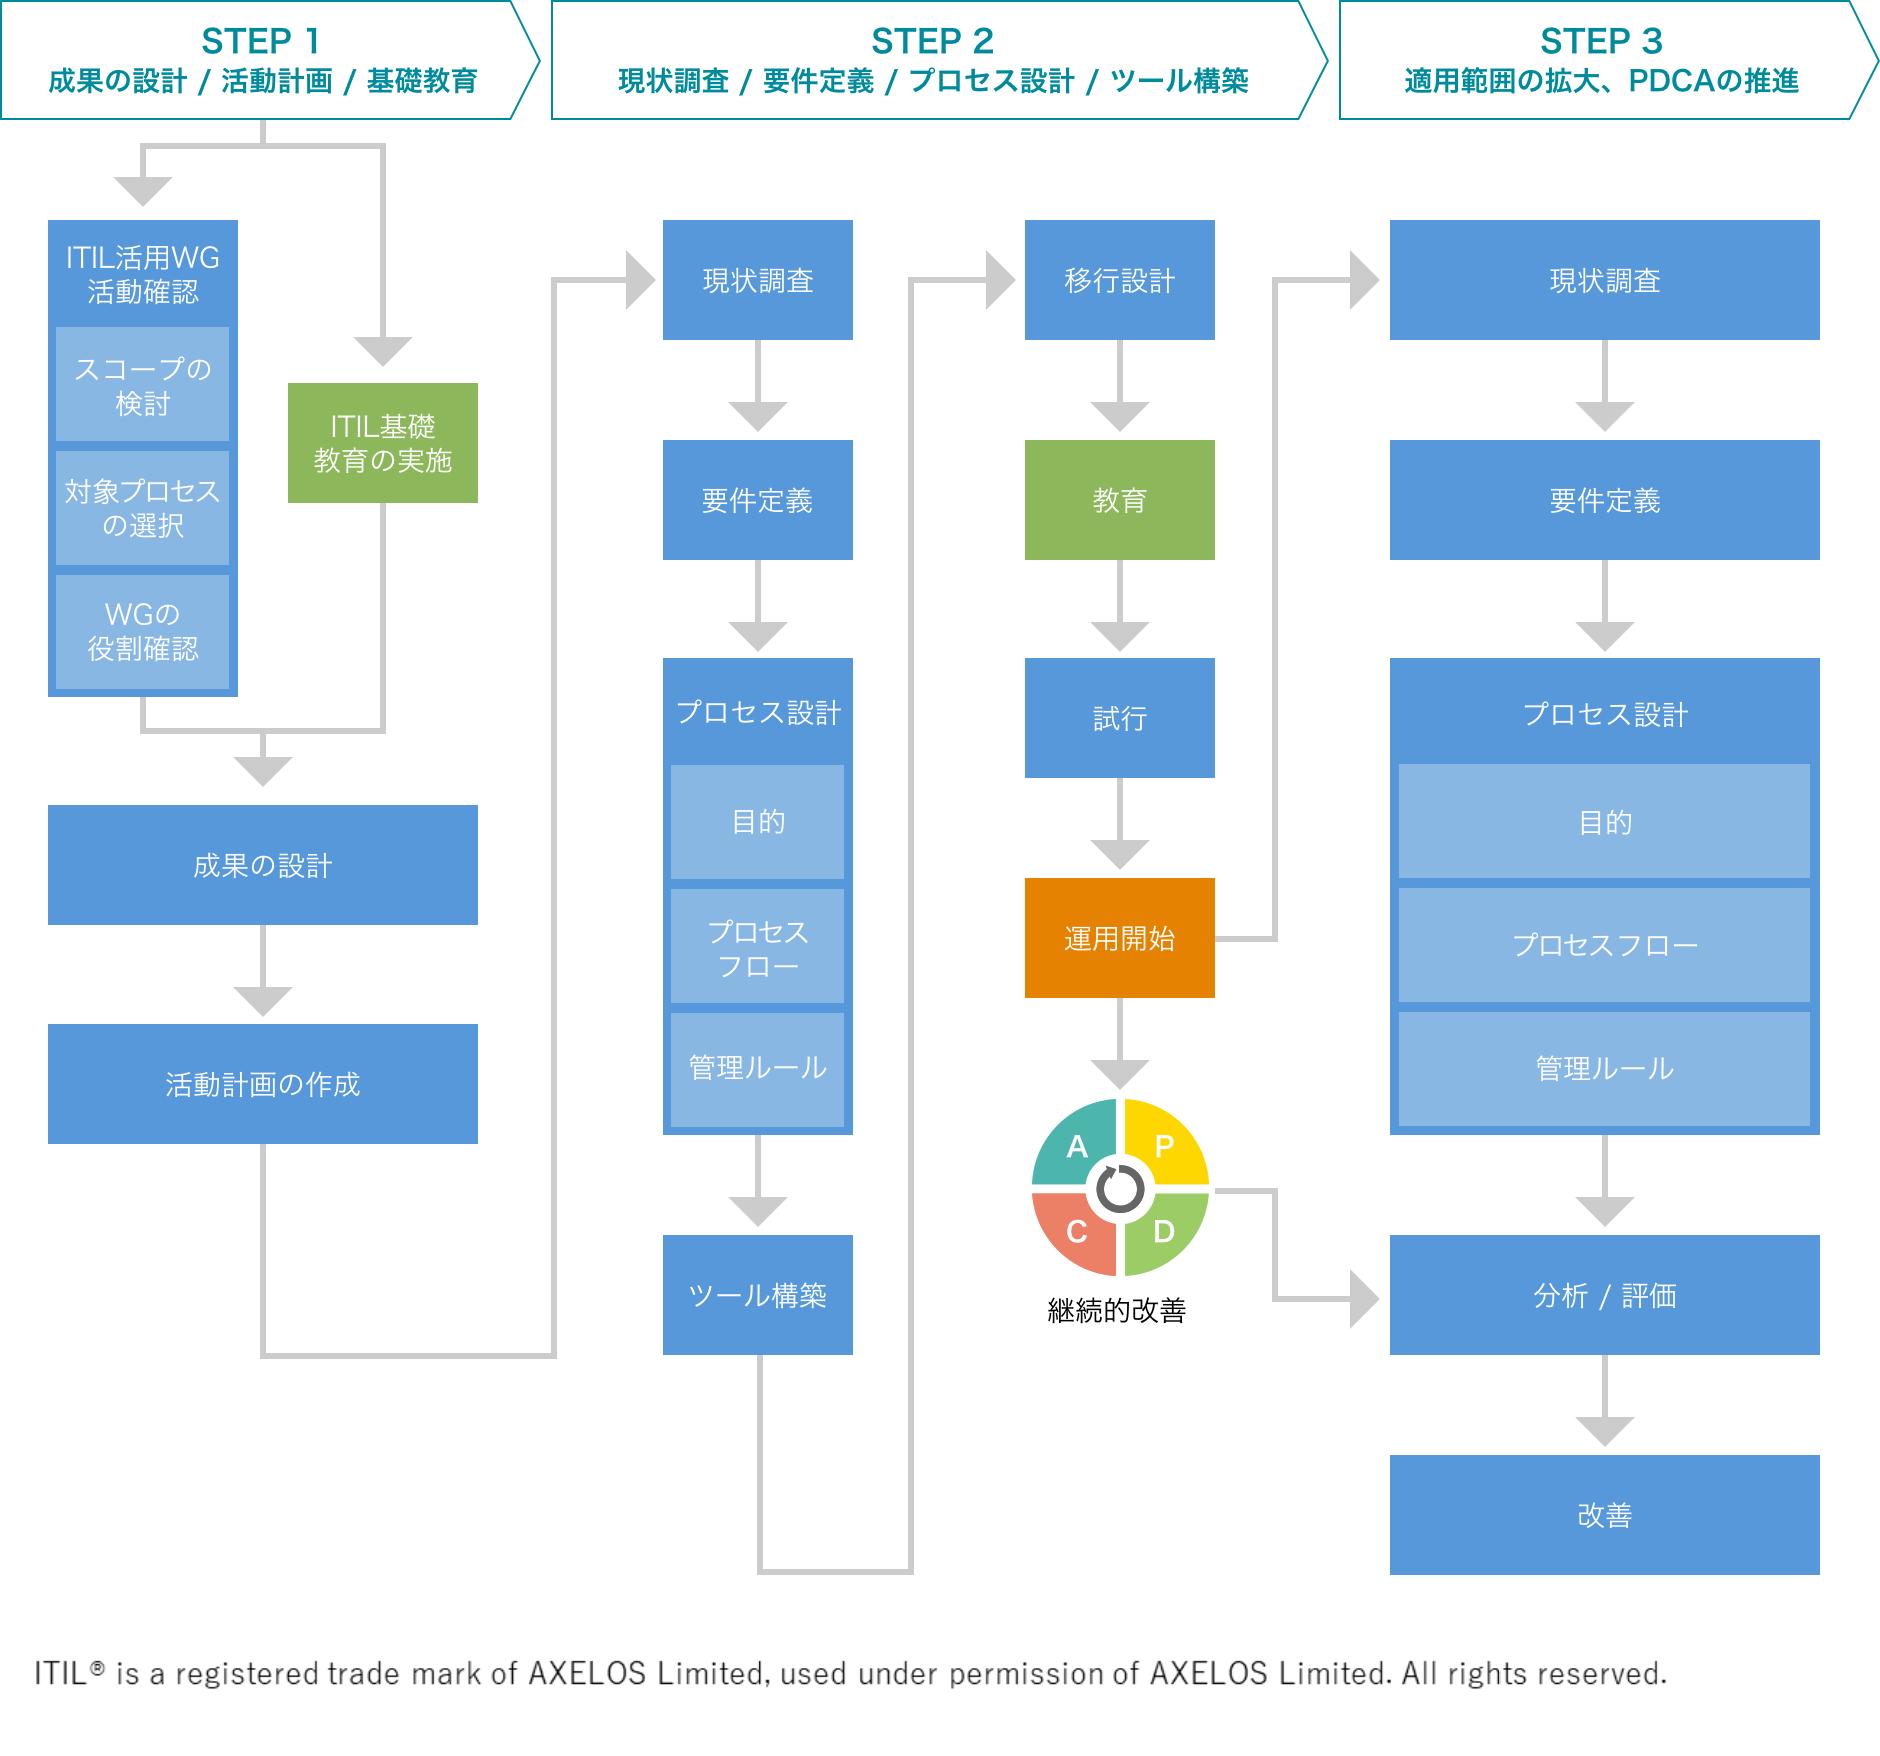 ITIL活用による品質改善、価値向上